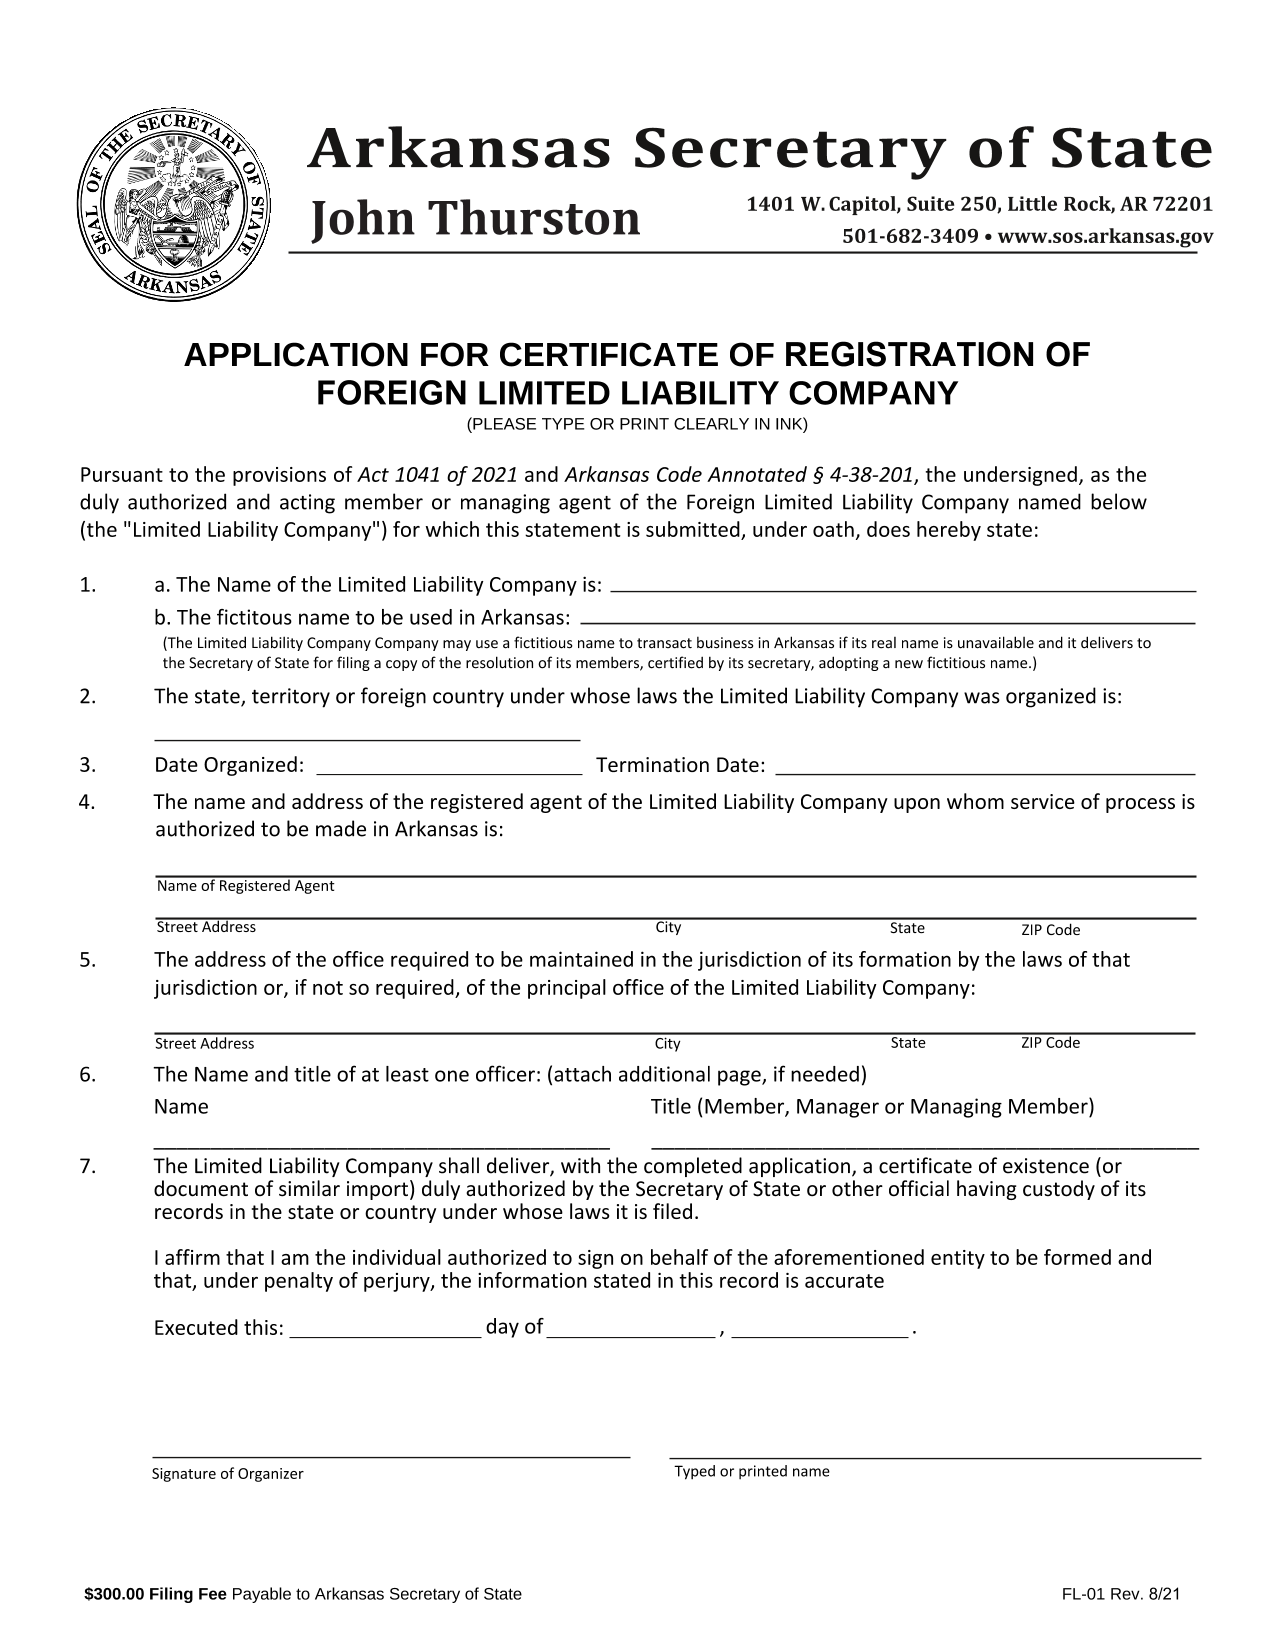 arkansas-foreign-llc-application-for-certificate-of-registration